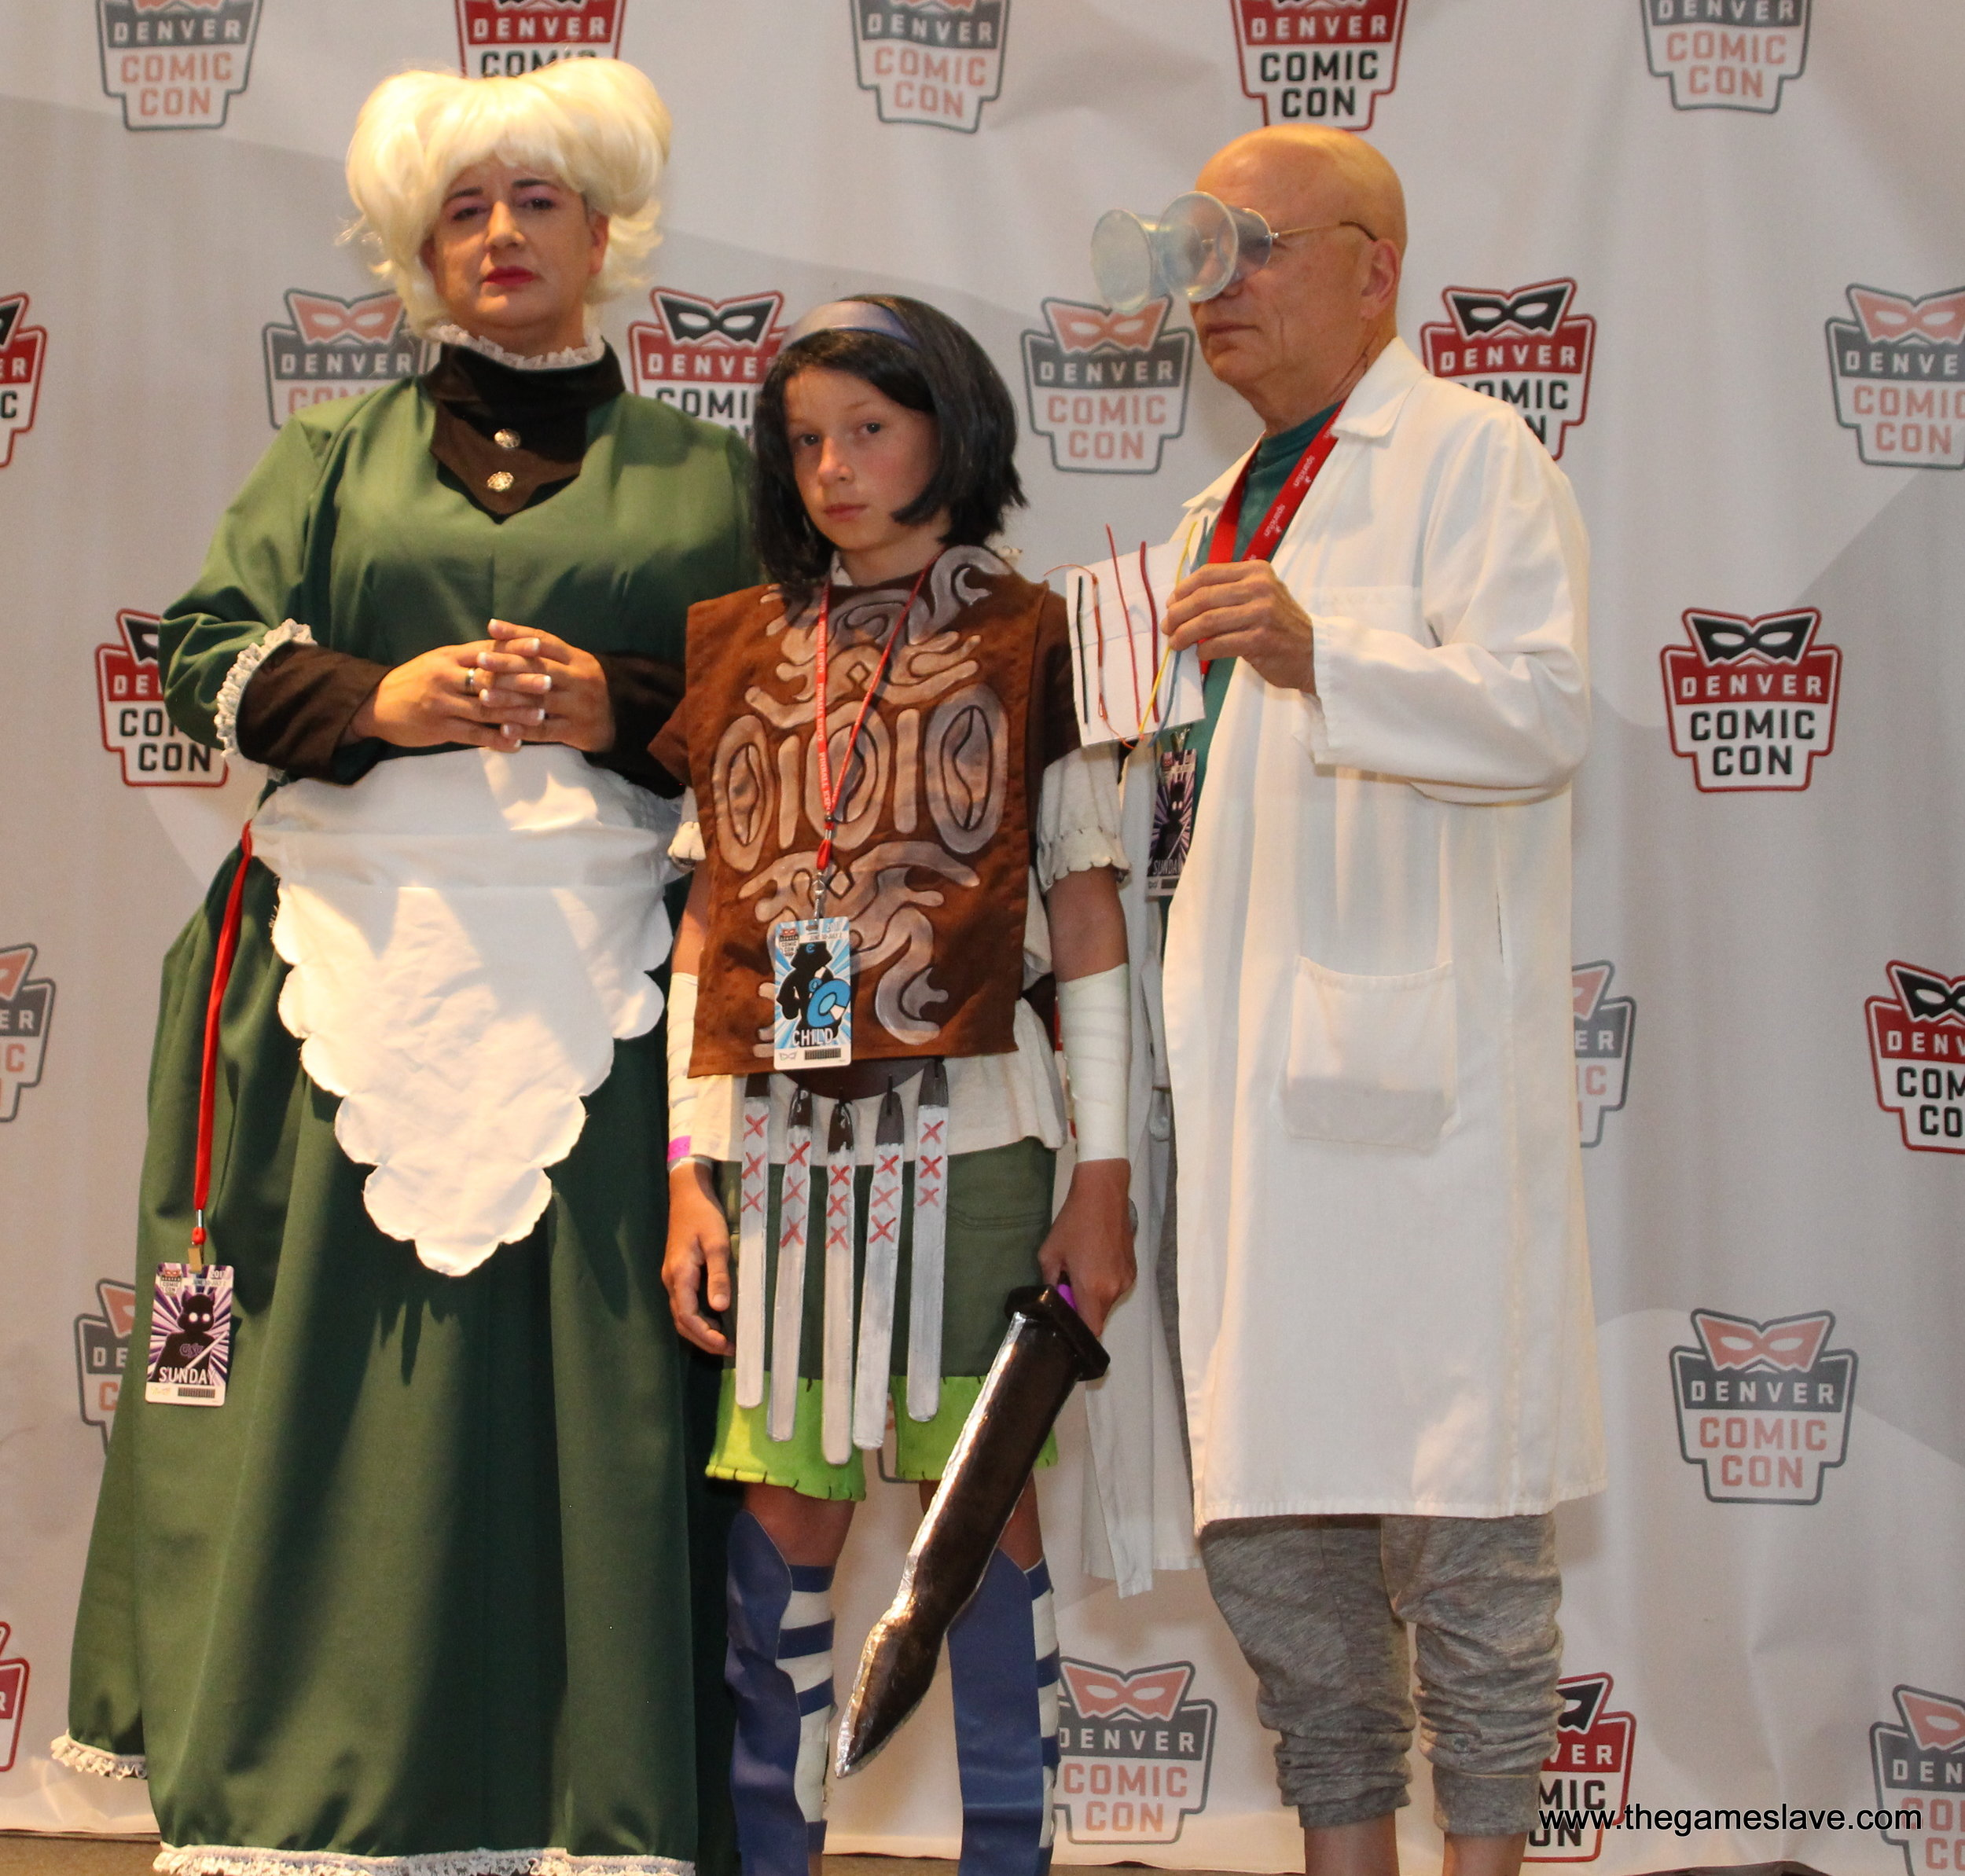 Denver Comic Con - Day 3 (10).JPG